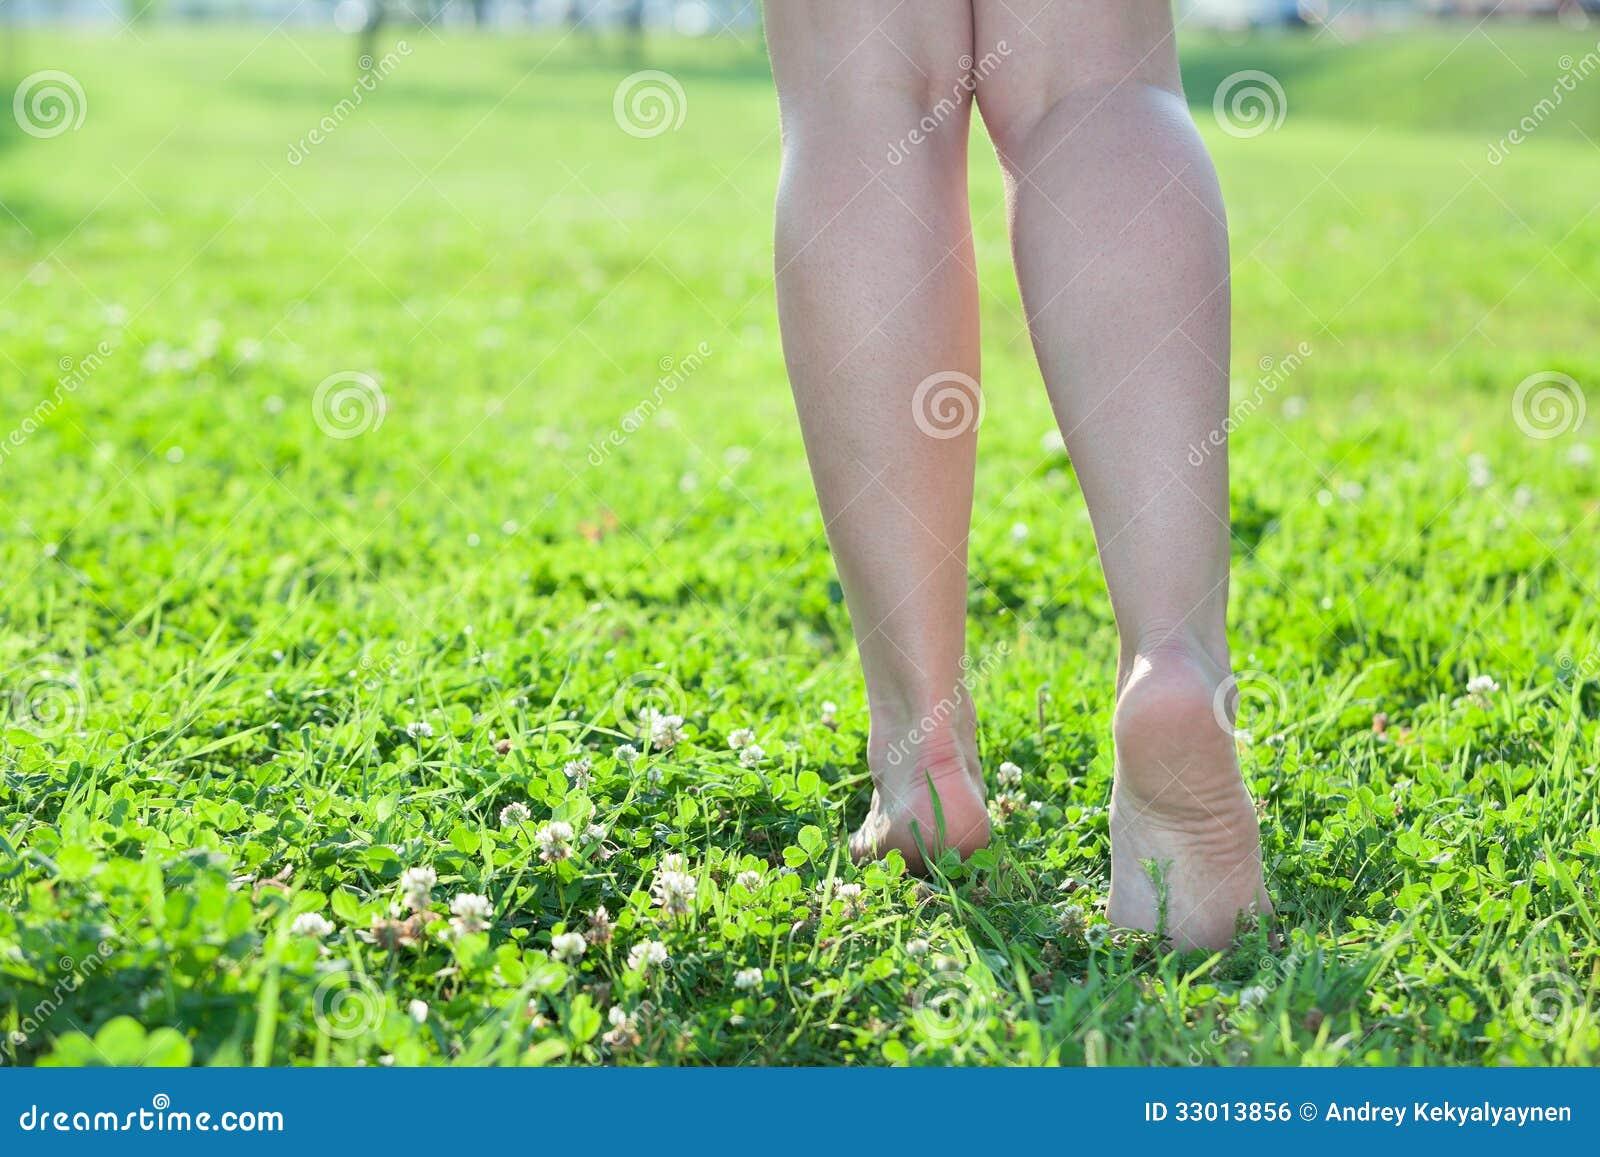 woman walking in grass - photo #2